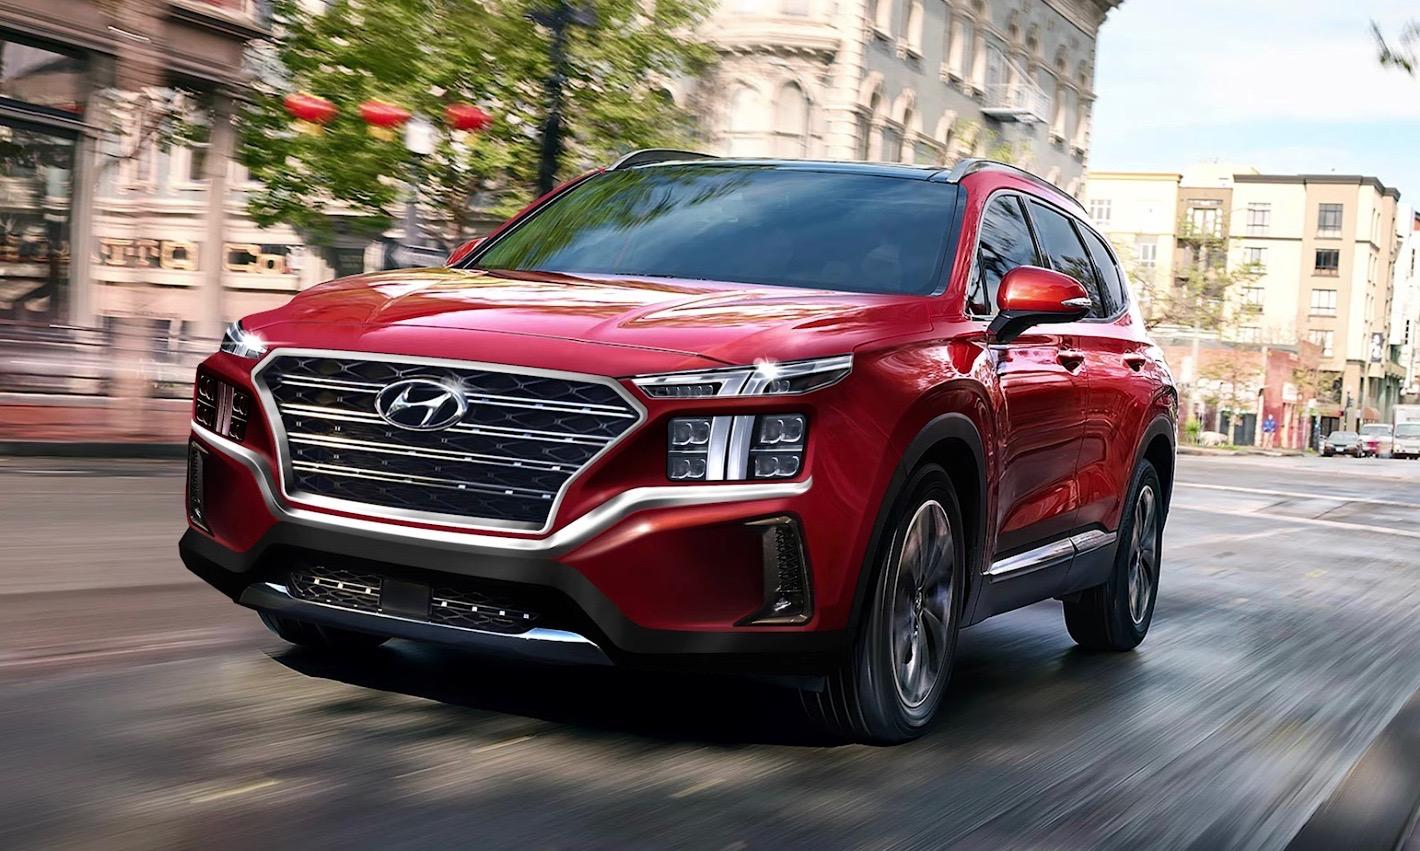 2021 Hyundai Santa Fe Facelift To Get 1 6t Hybrid Sorento Specs Leaked Performancedrive